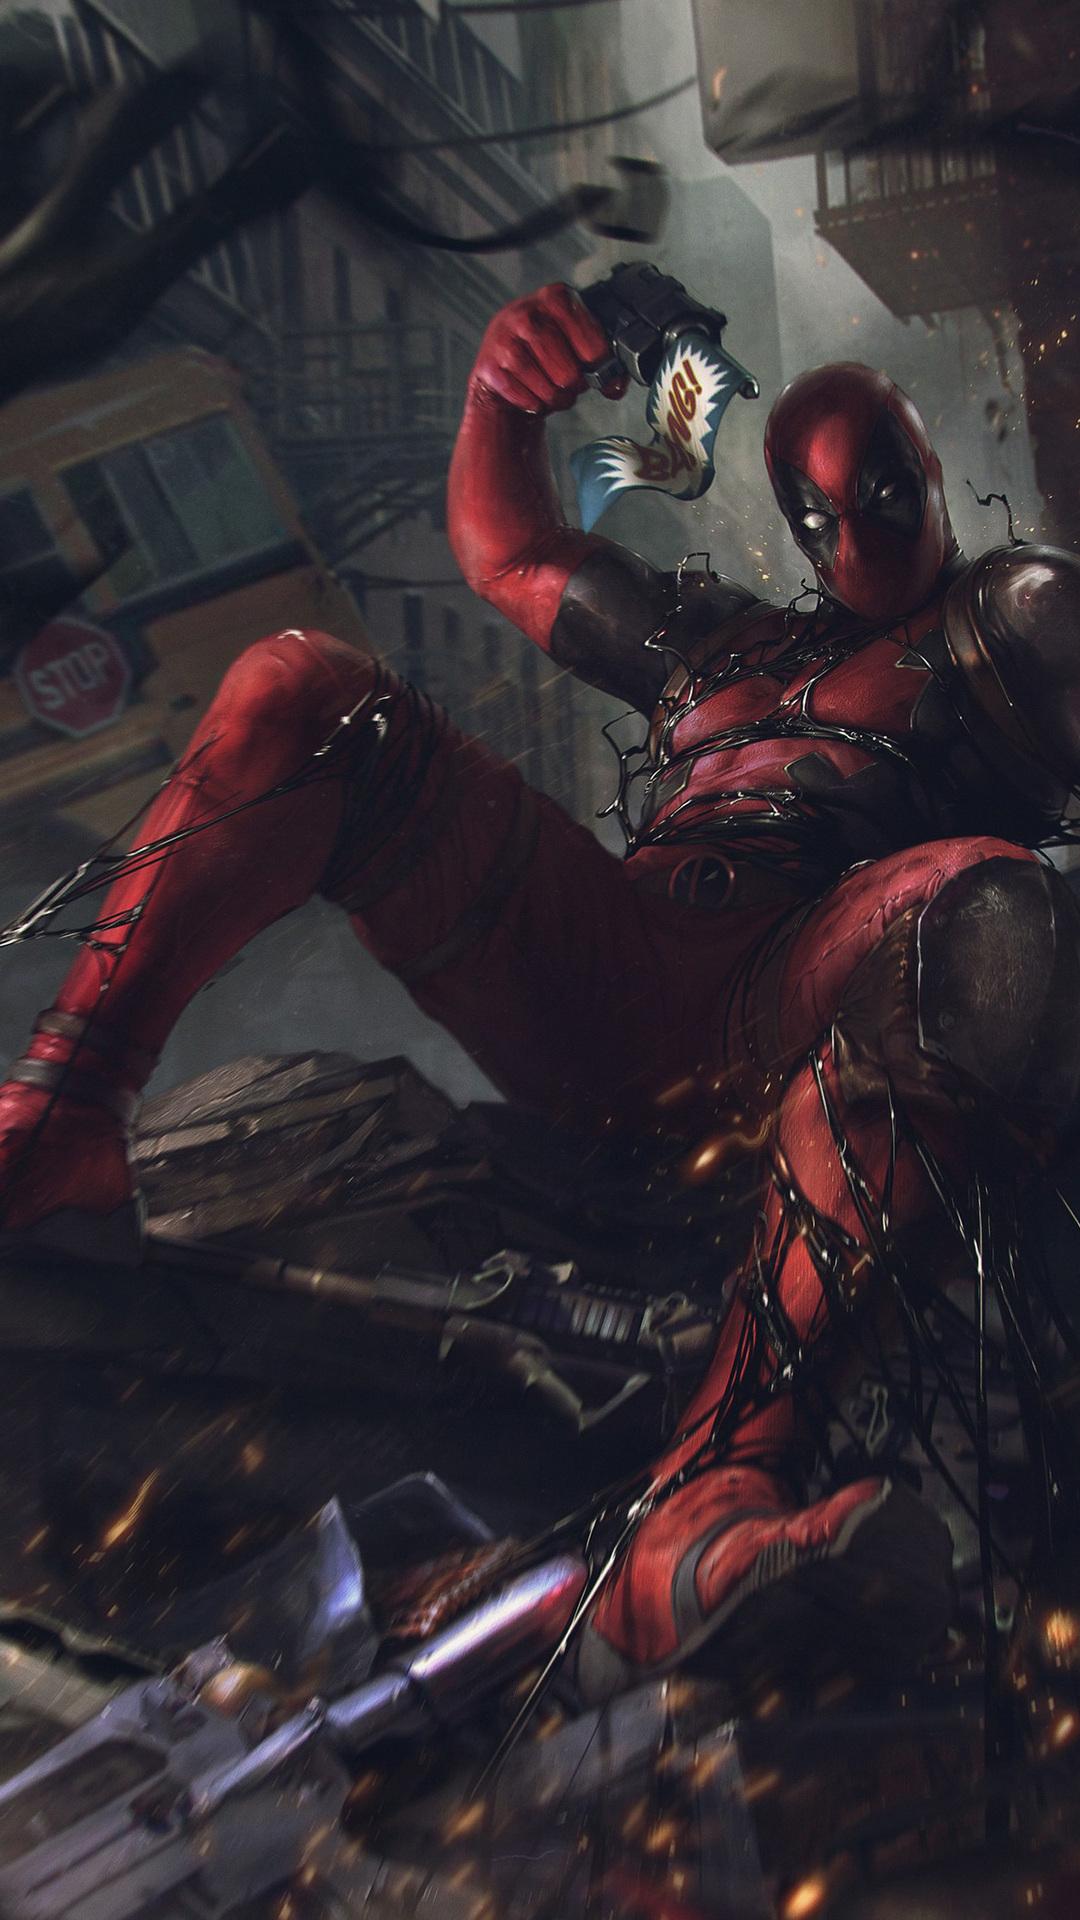 1080x1920 Deadpool Vs Venom Symbiote Iphone 7 6s 6 Plus Pixel Xl